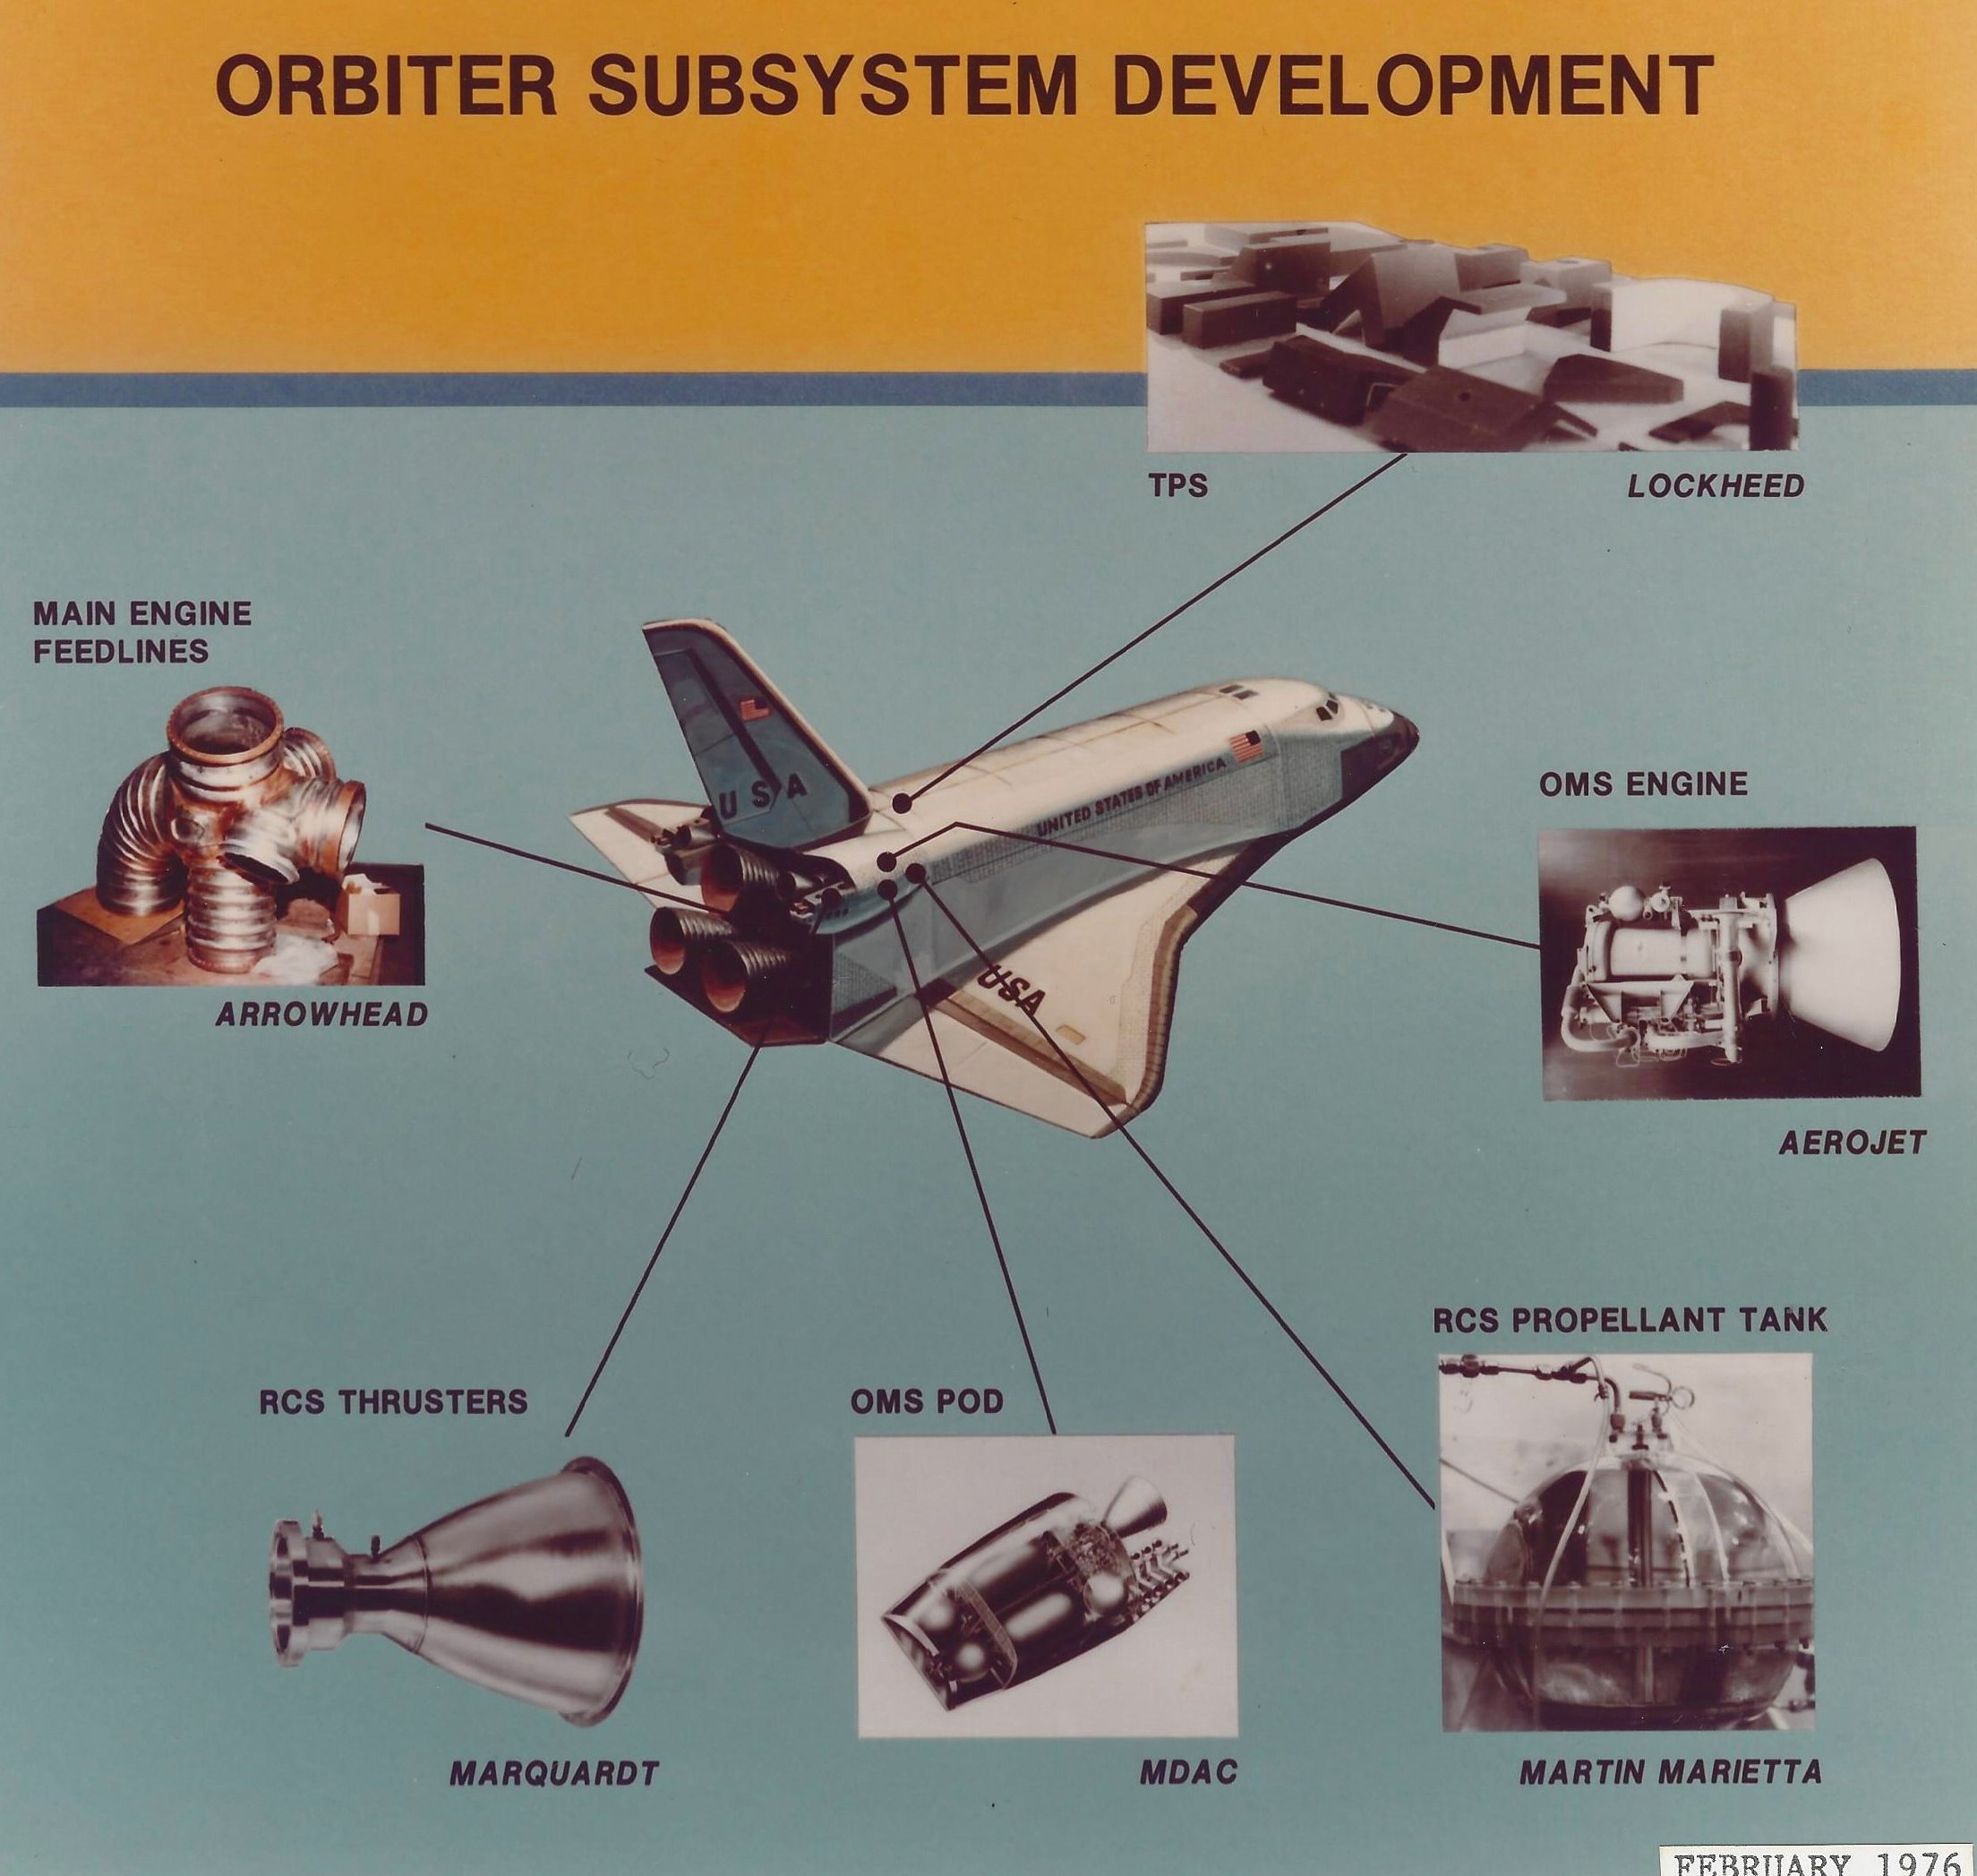 Orbiter 102 Crew Module April 1977 sub-system development Downe.jpg